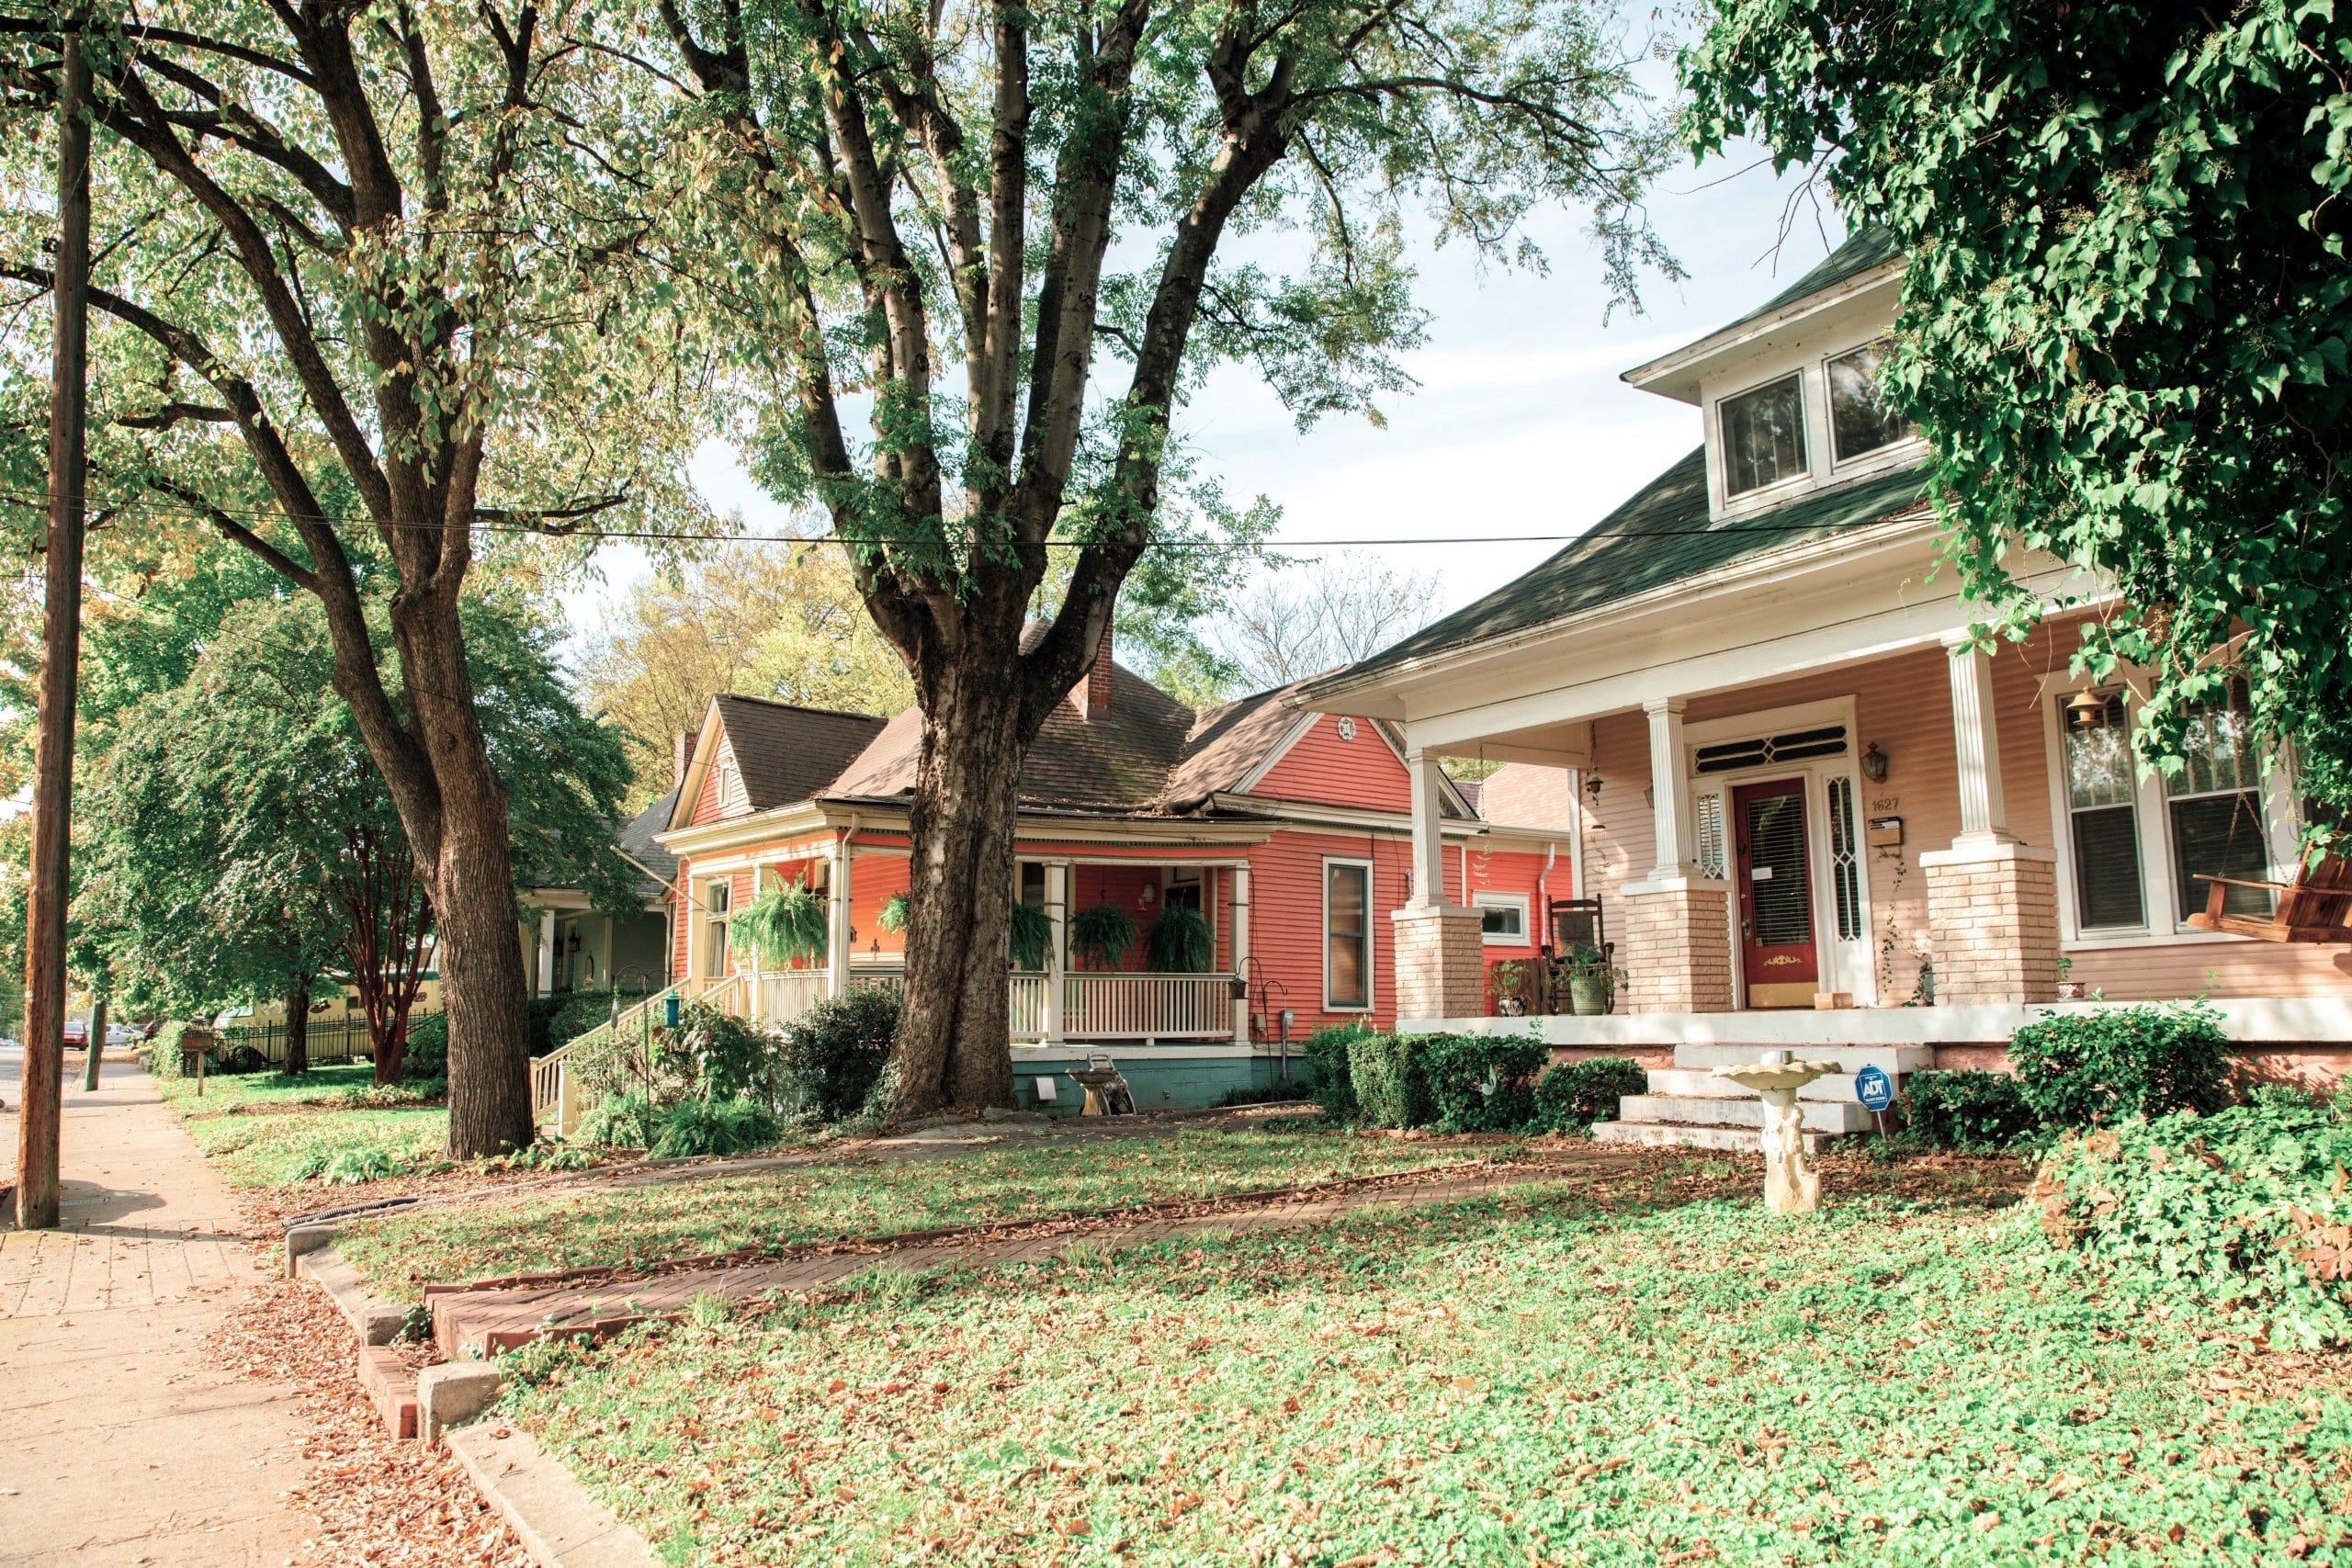 East Nashville neighborhood